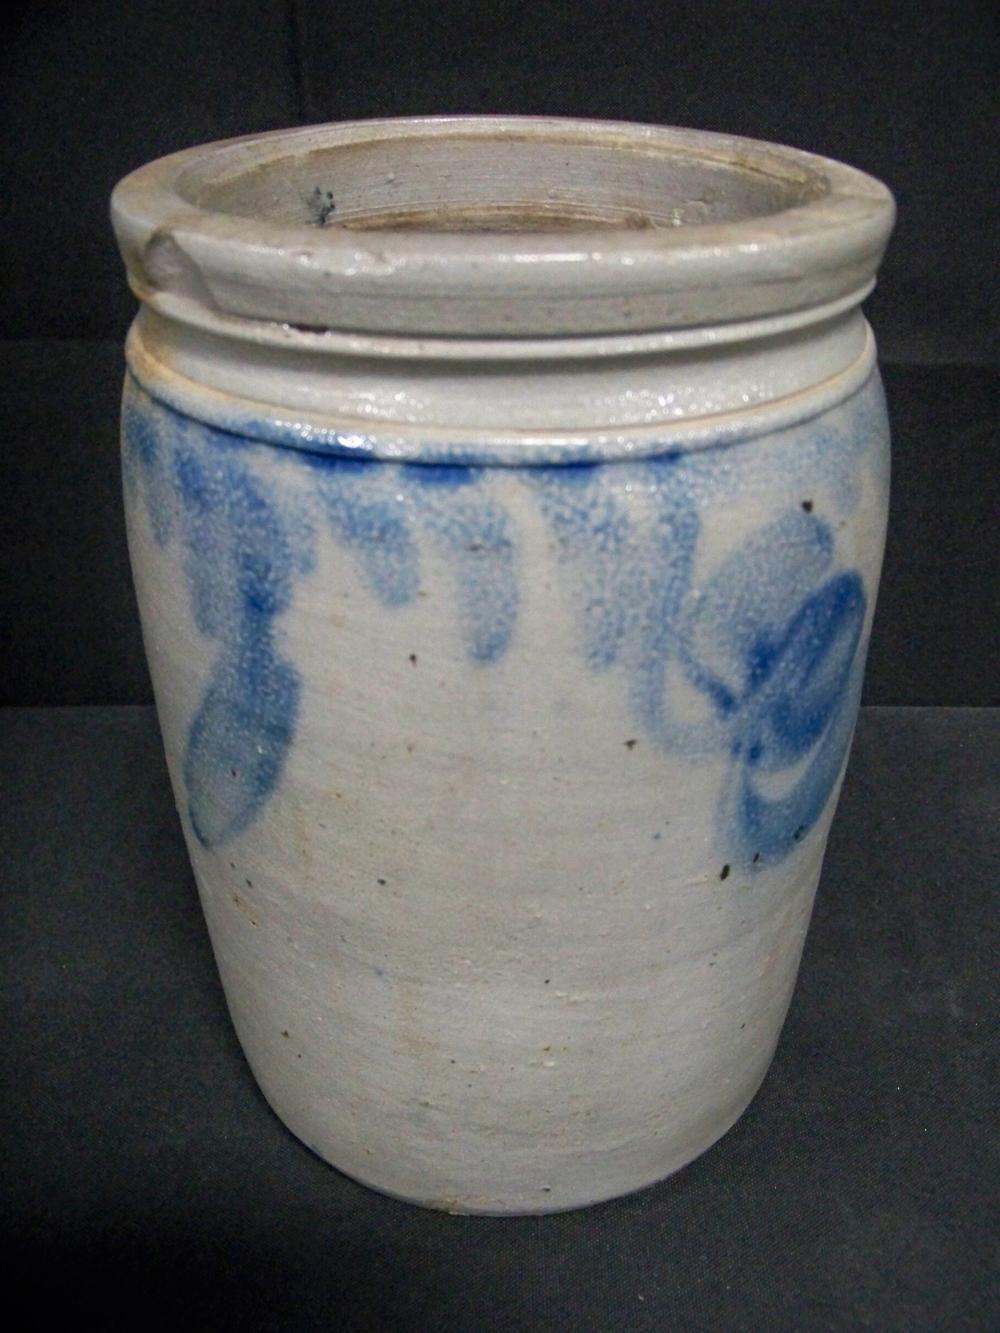 Antique Stoneware Crock with Blue Decoration